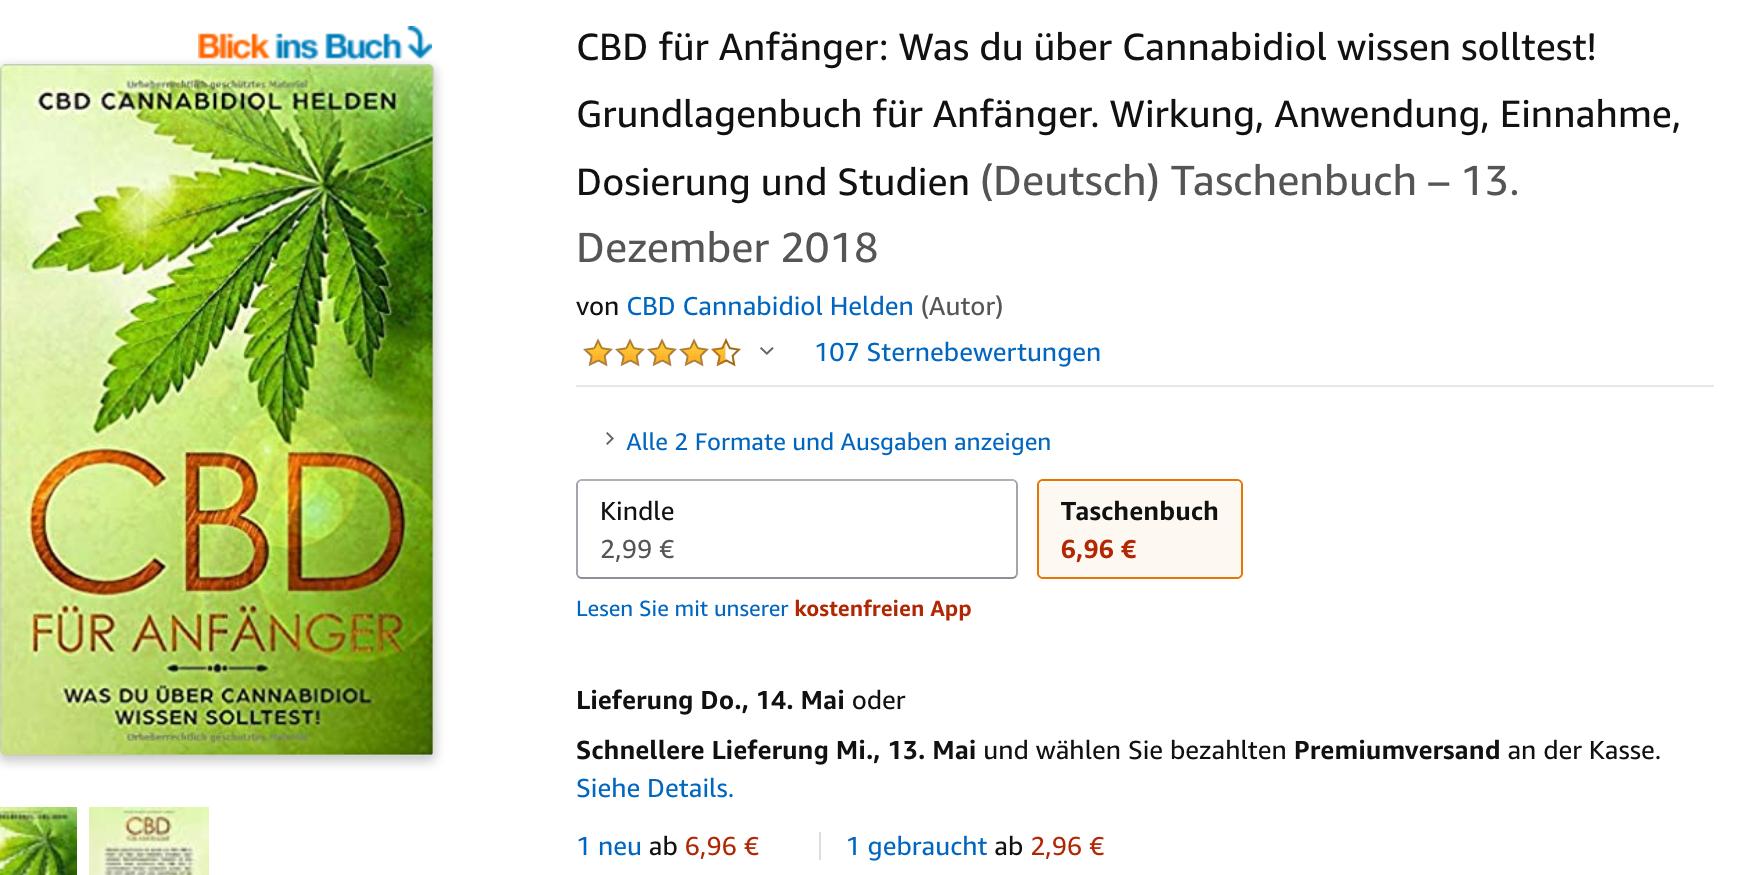 CBD Buch Cannabidiol Grundlagenbuch für Anfänger. Wirkung, Anwendung, Einnahme